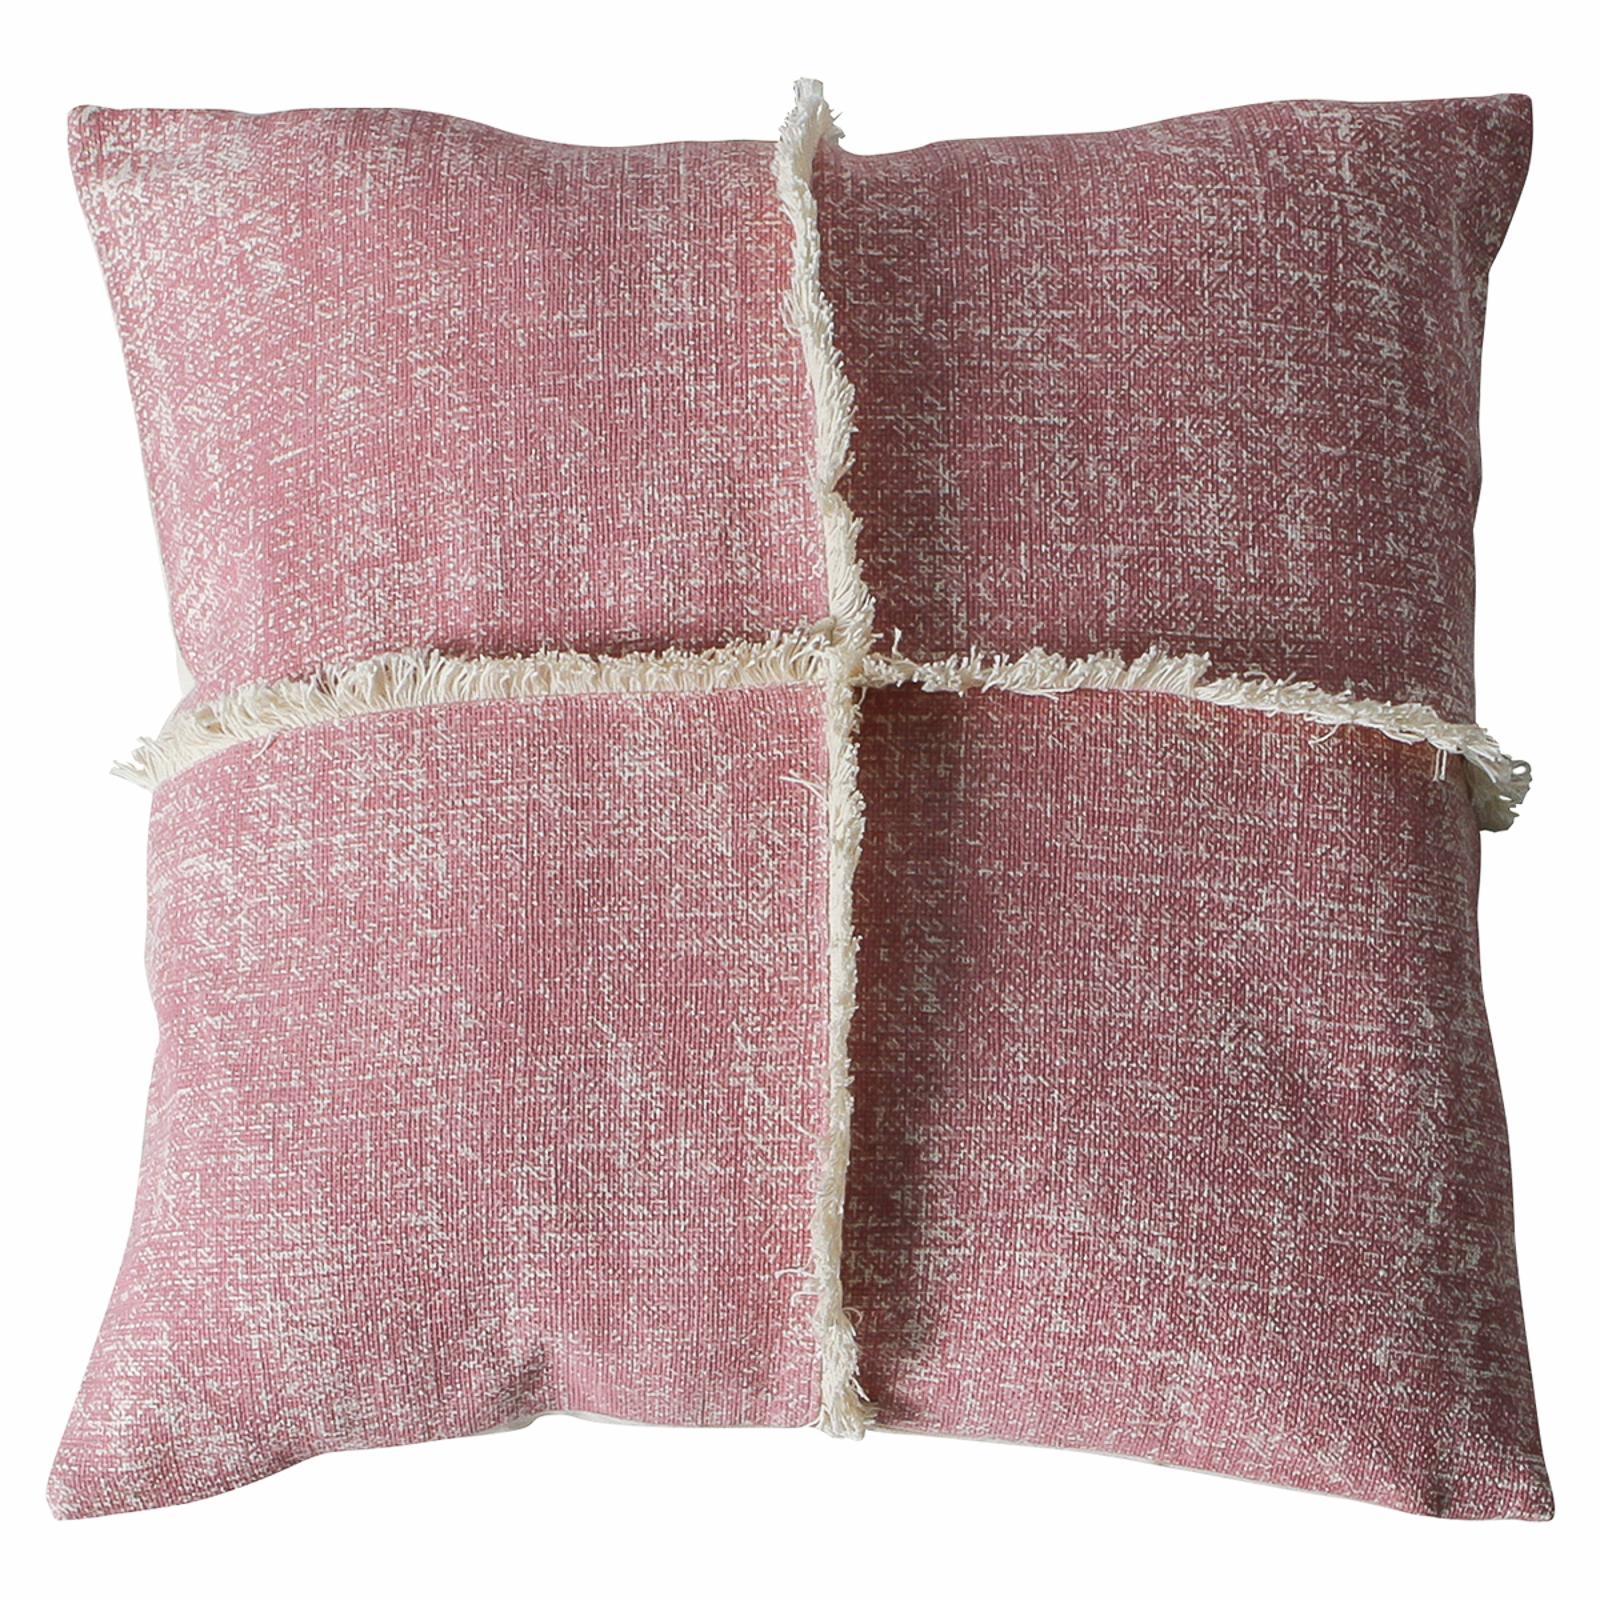 Grace 450 x 450mm Blush Fringe Cushion